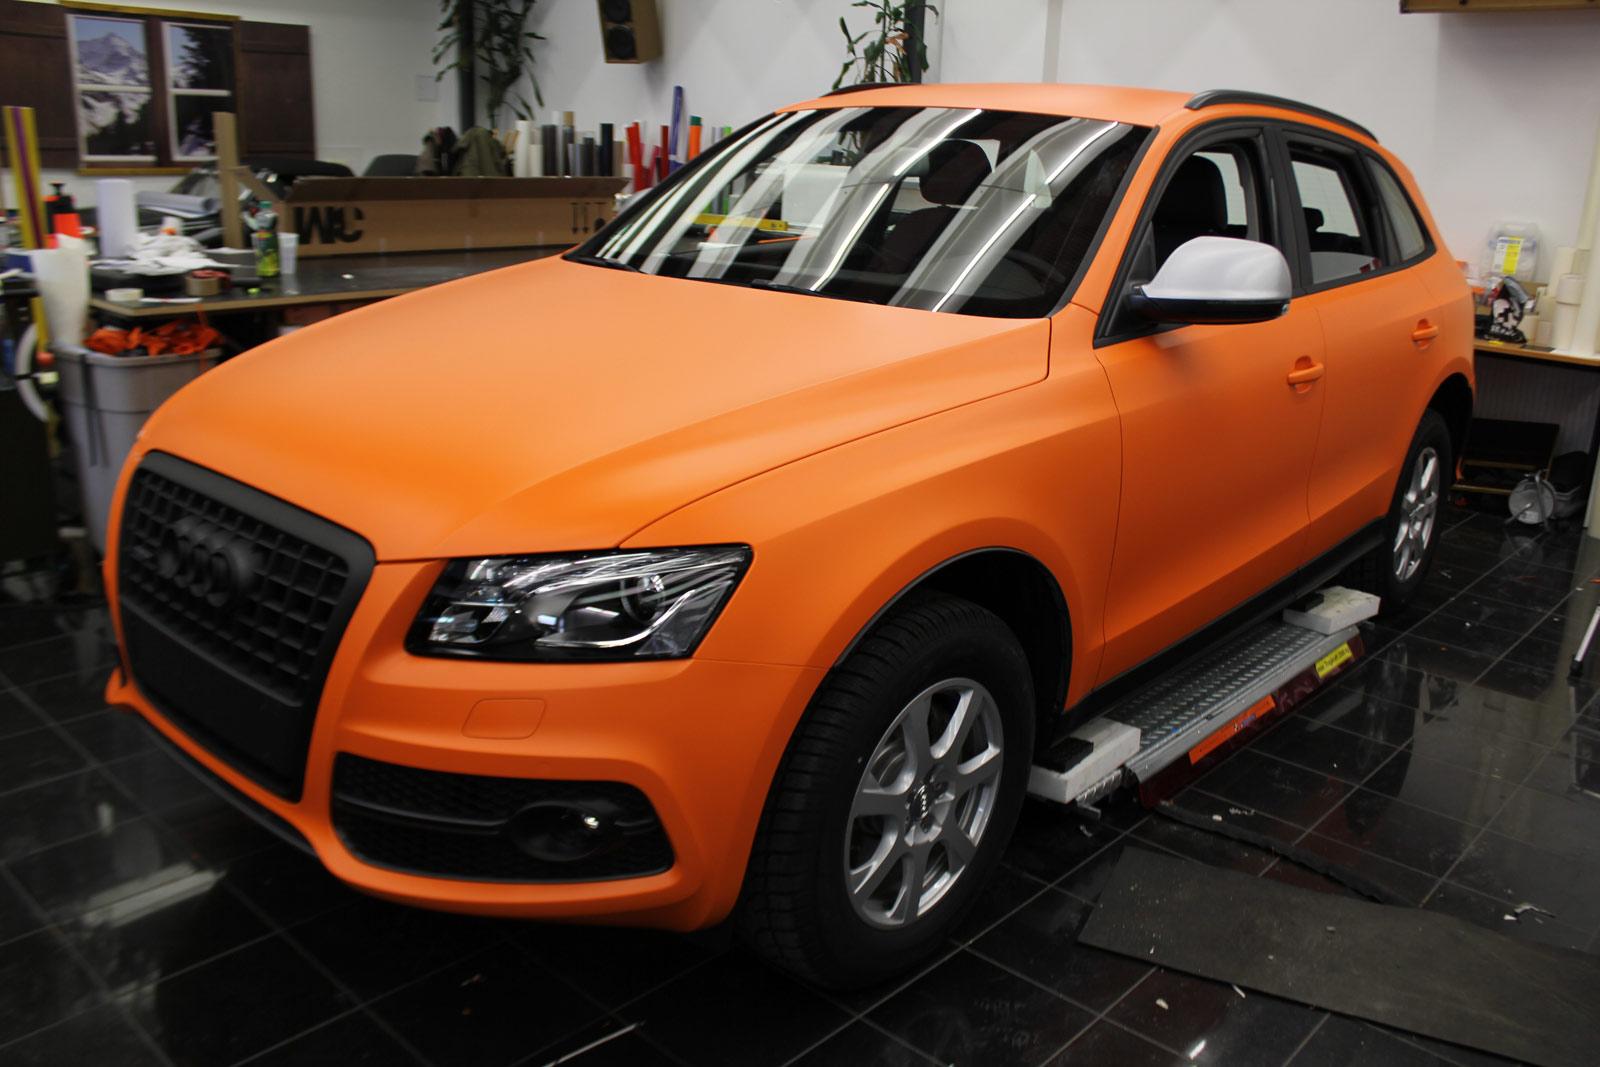 Audi_Q5_Folierung_Orange_Matt_19